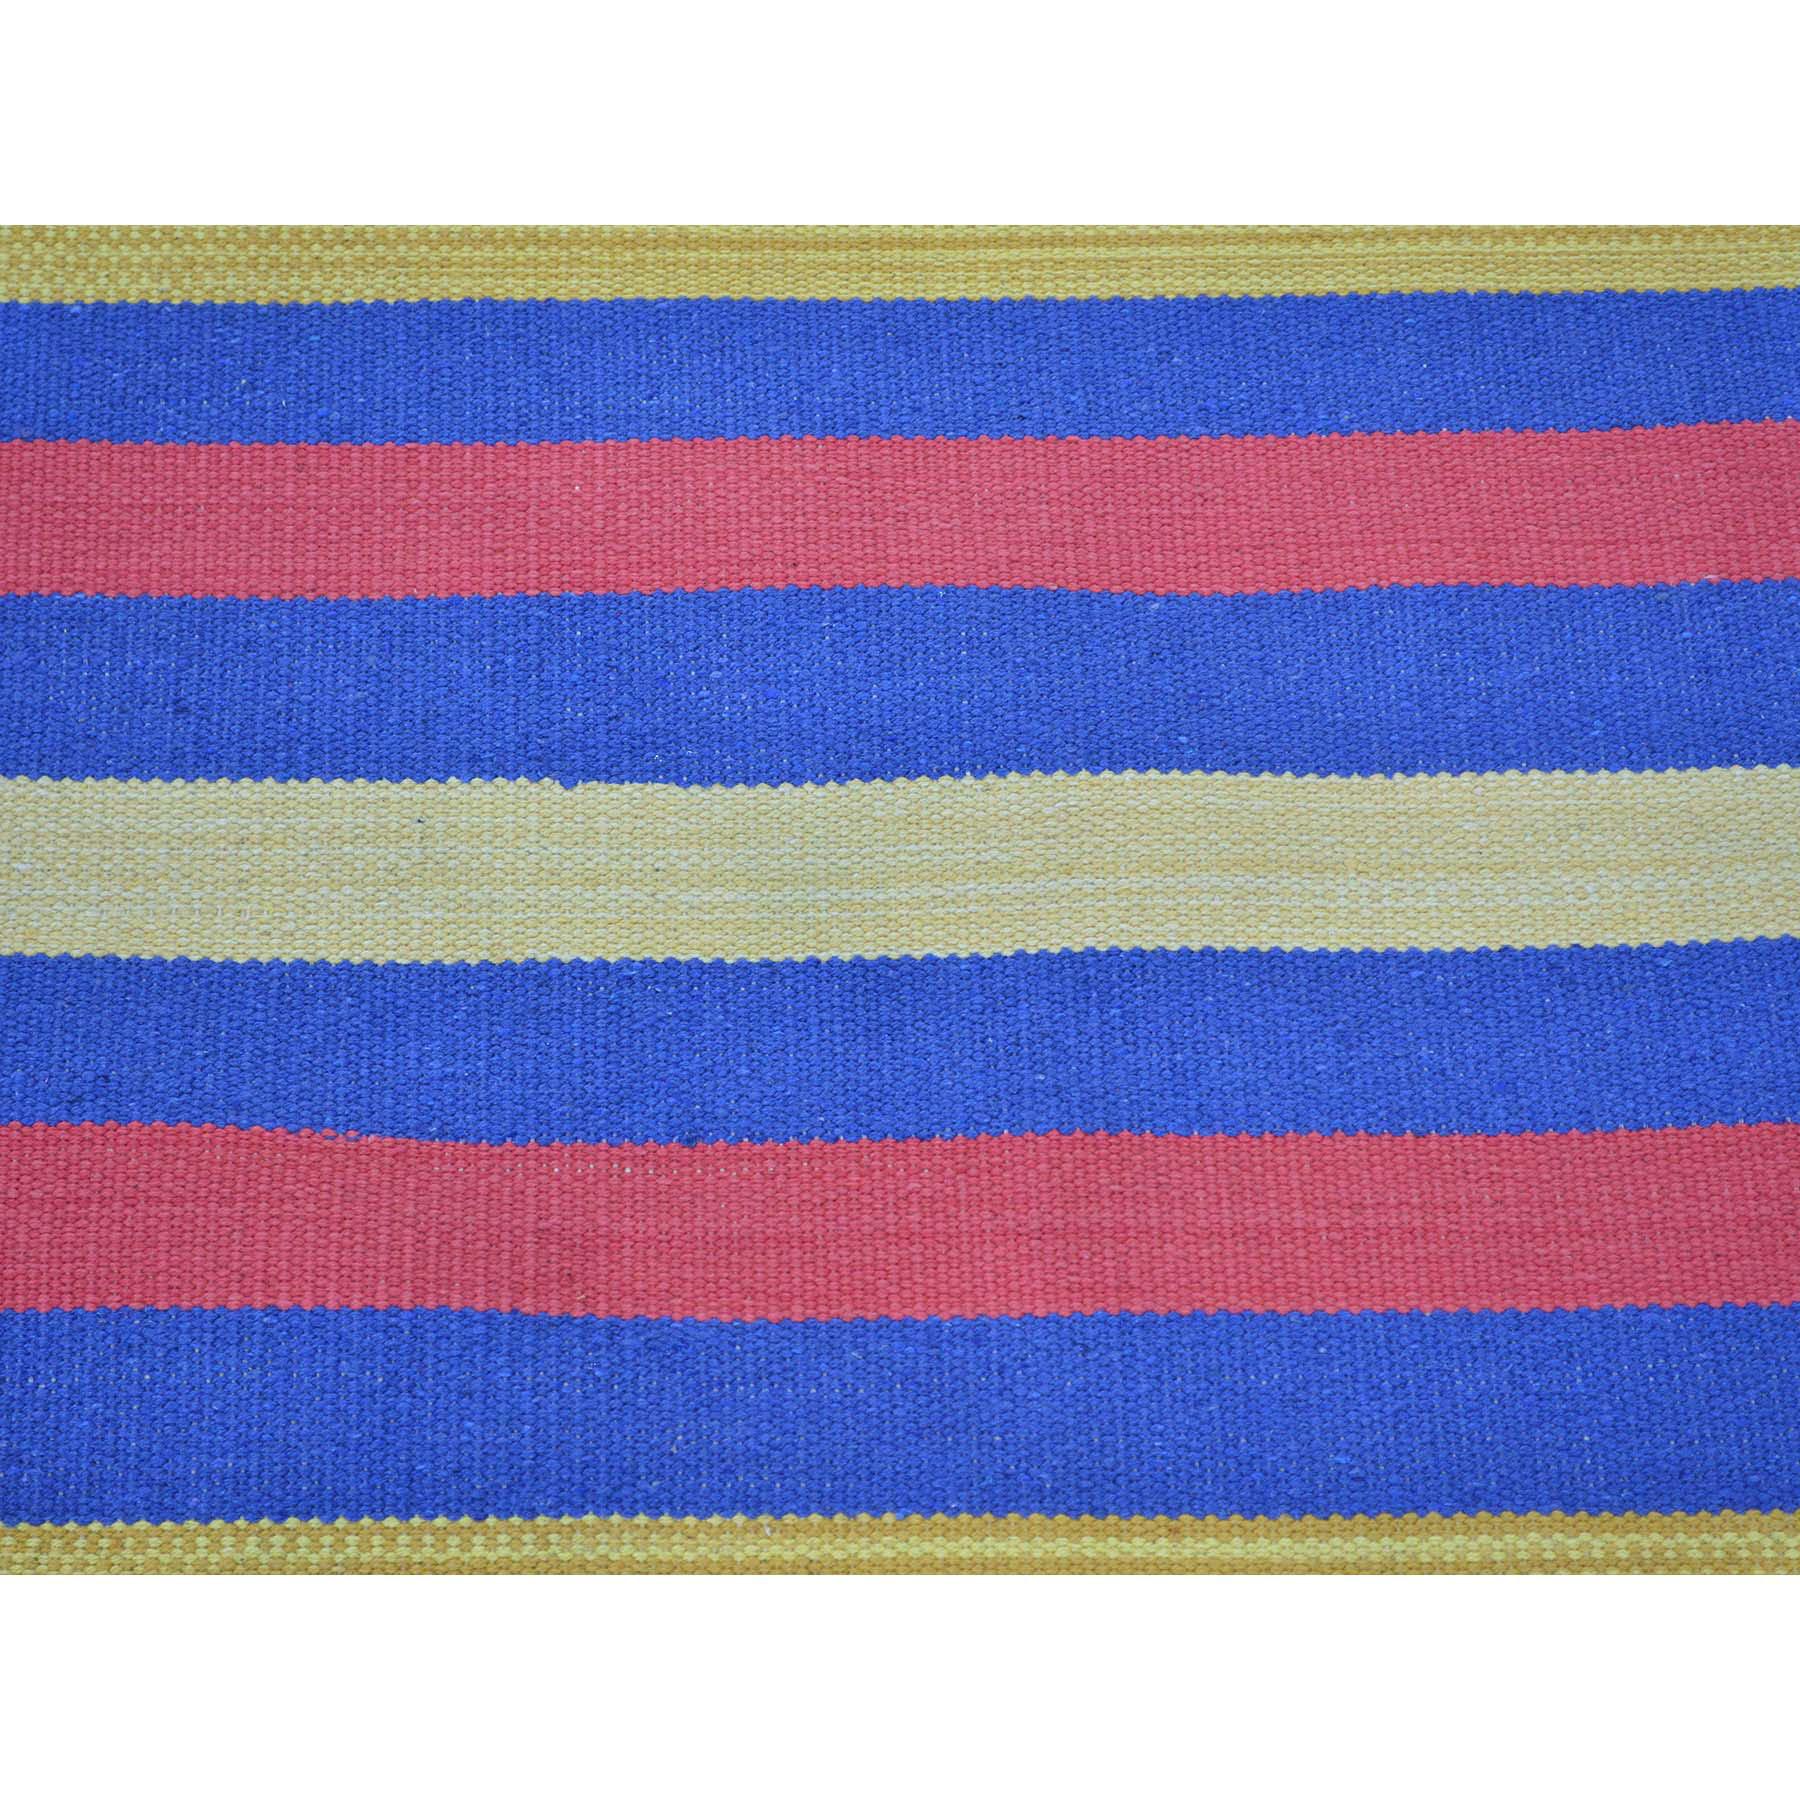 5-x7-1  Flat Weave Hand Woven Navajo Design Reversible Killim Rug